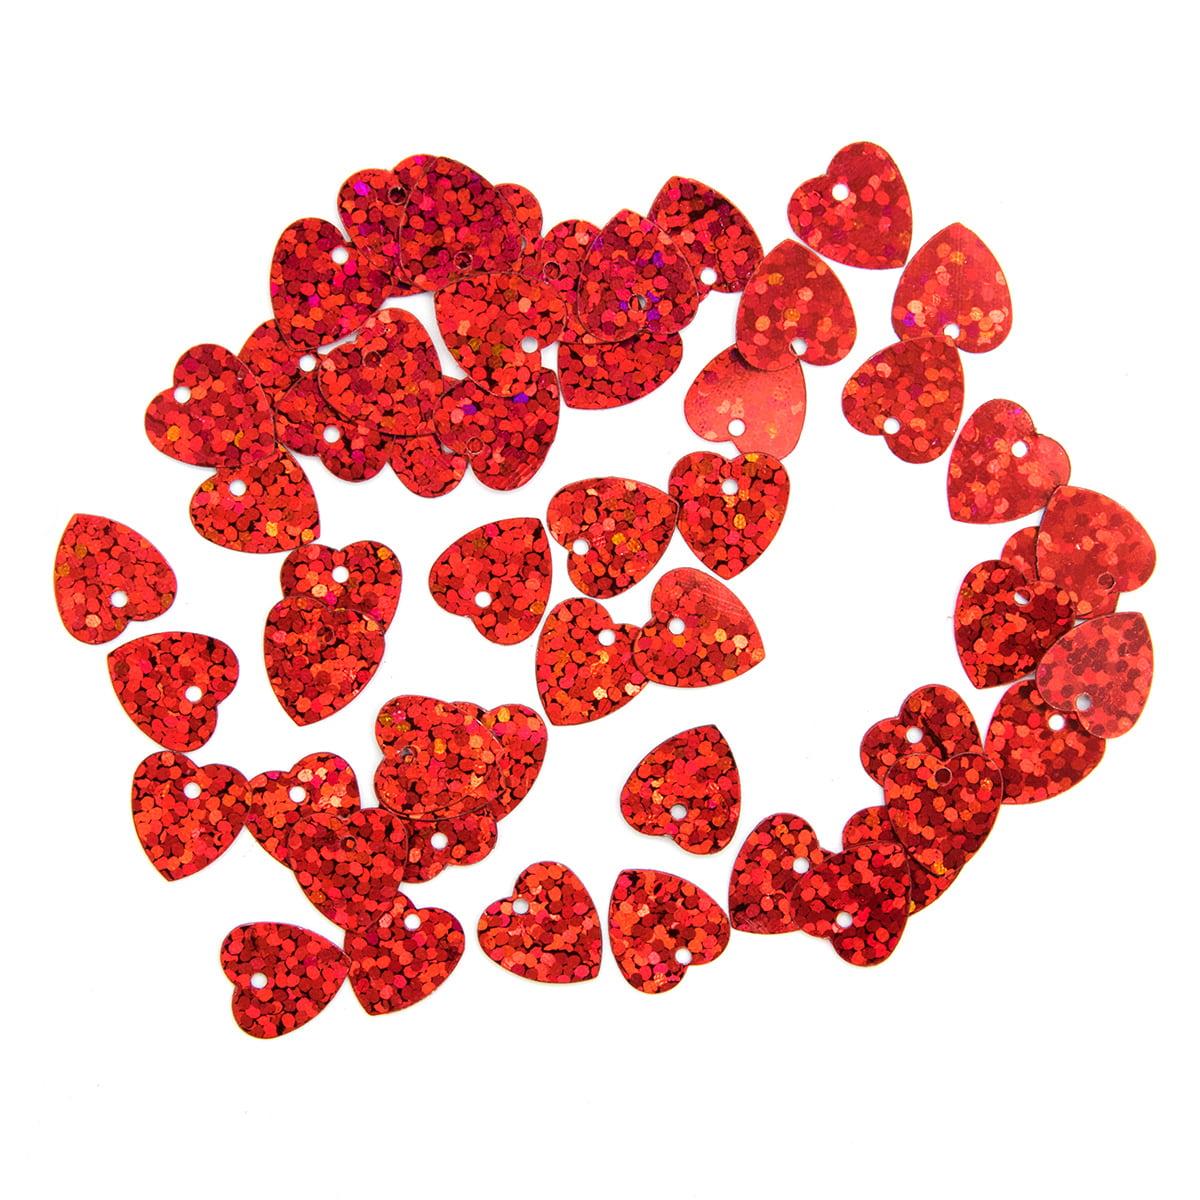 Пайетки 'сердечки', 10*10 мм, упак./10 гр., 'Астра'